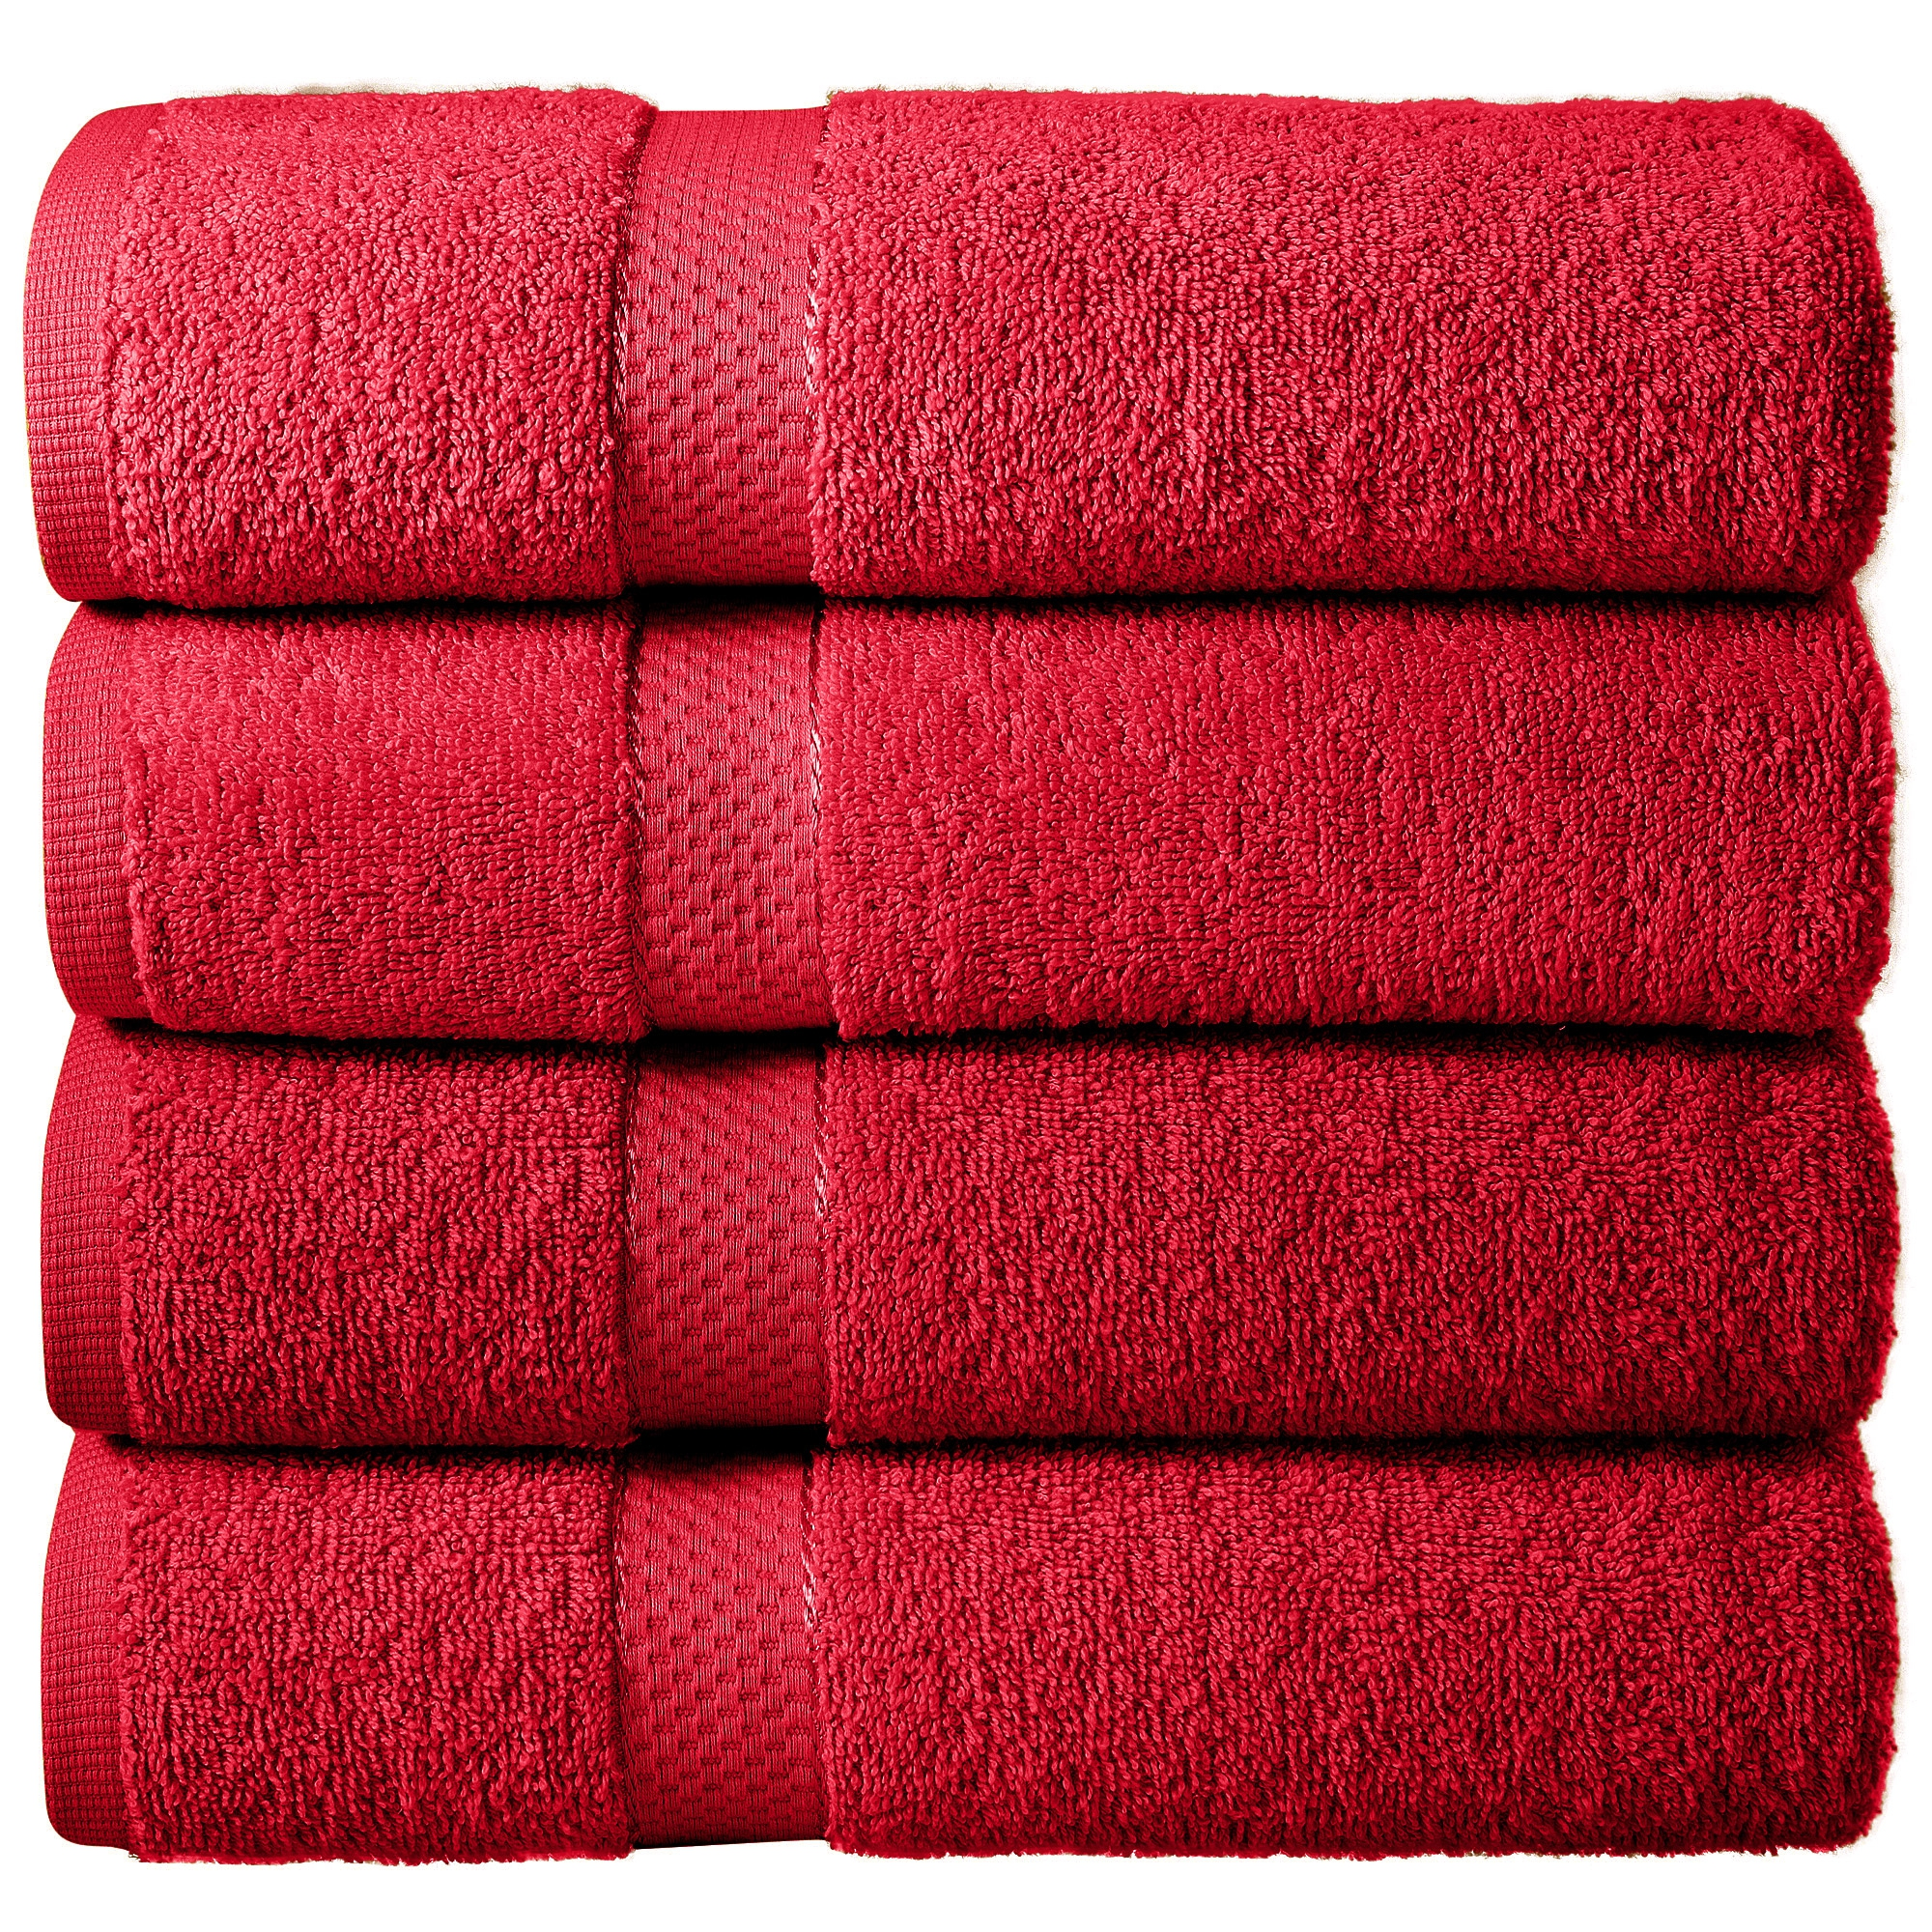 Bale Set 4pcs Red Viscose Plain Bath Sheet Towel